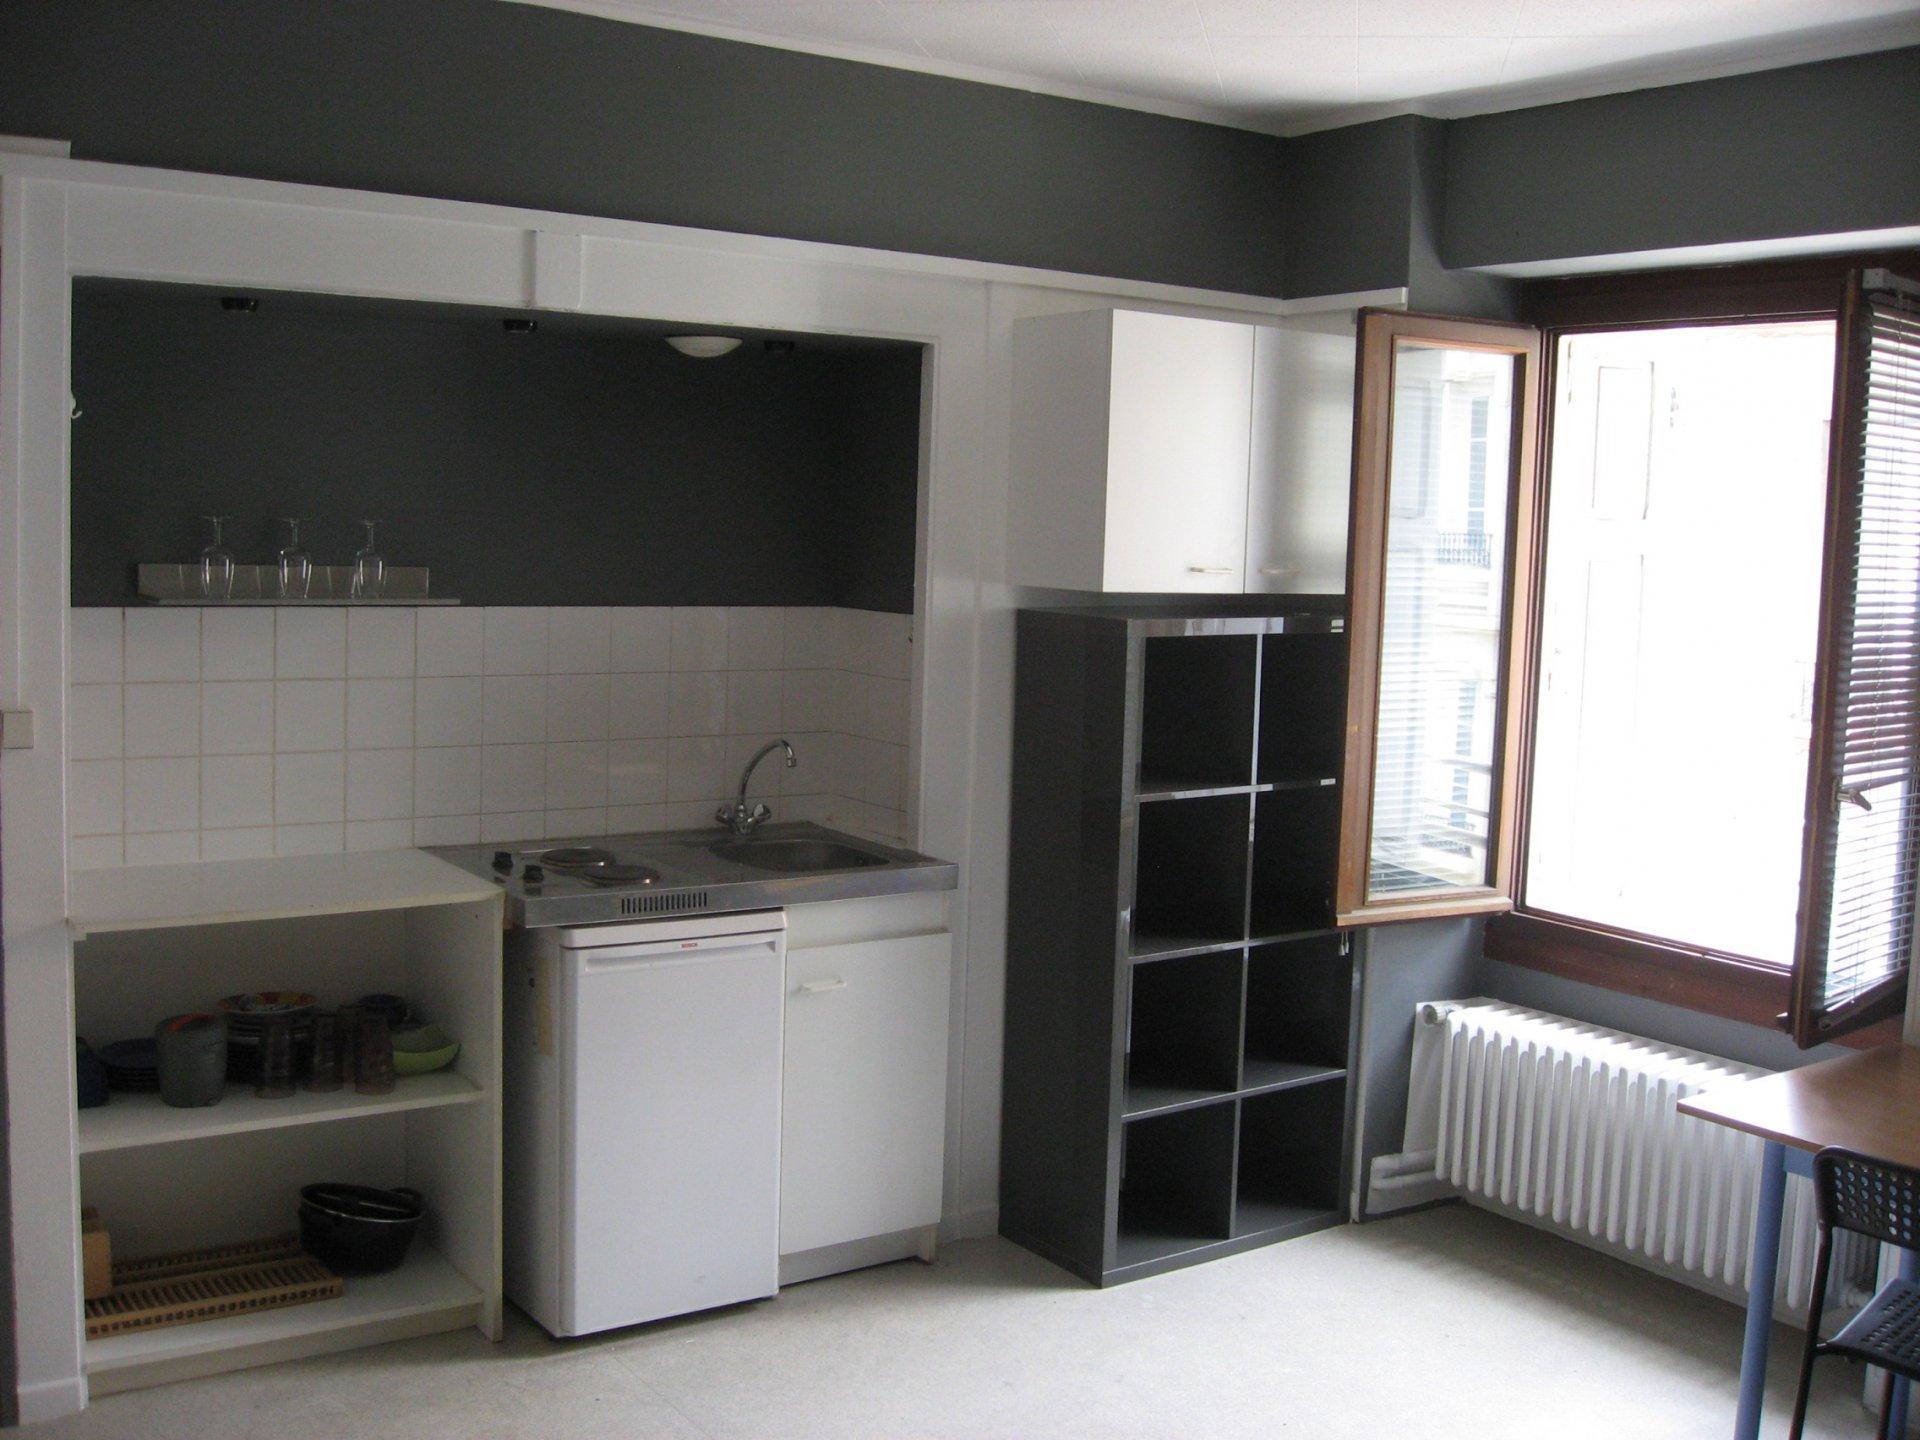 Studio loué 23m2 meublé Résidence Etudiante